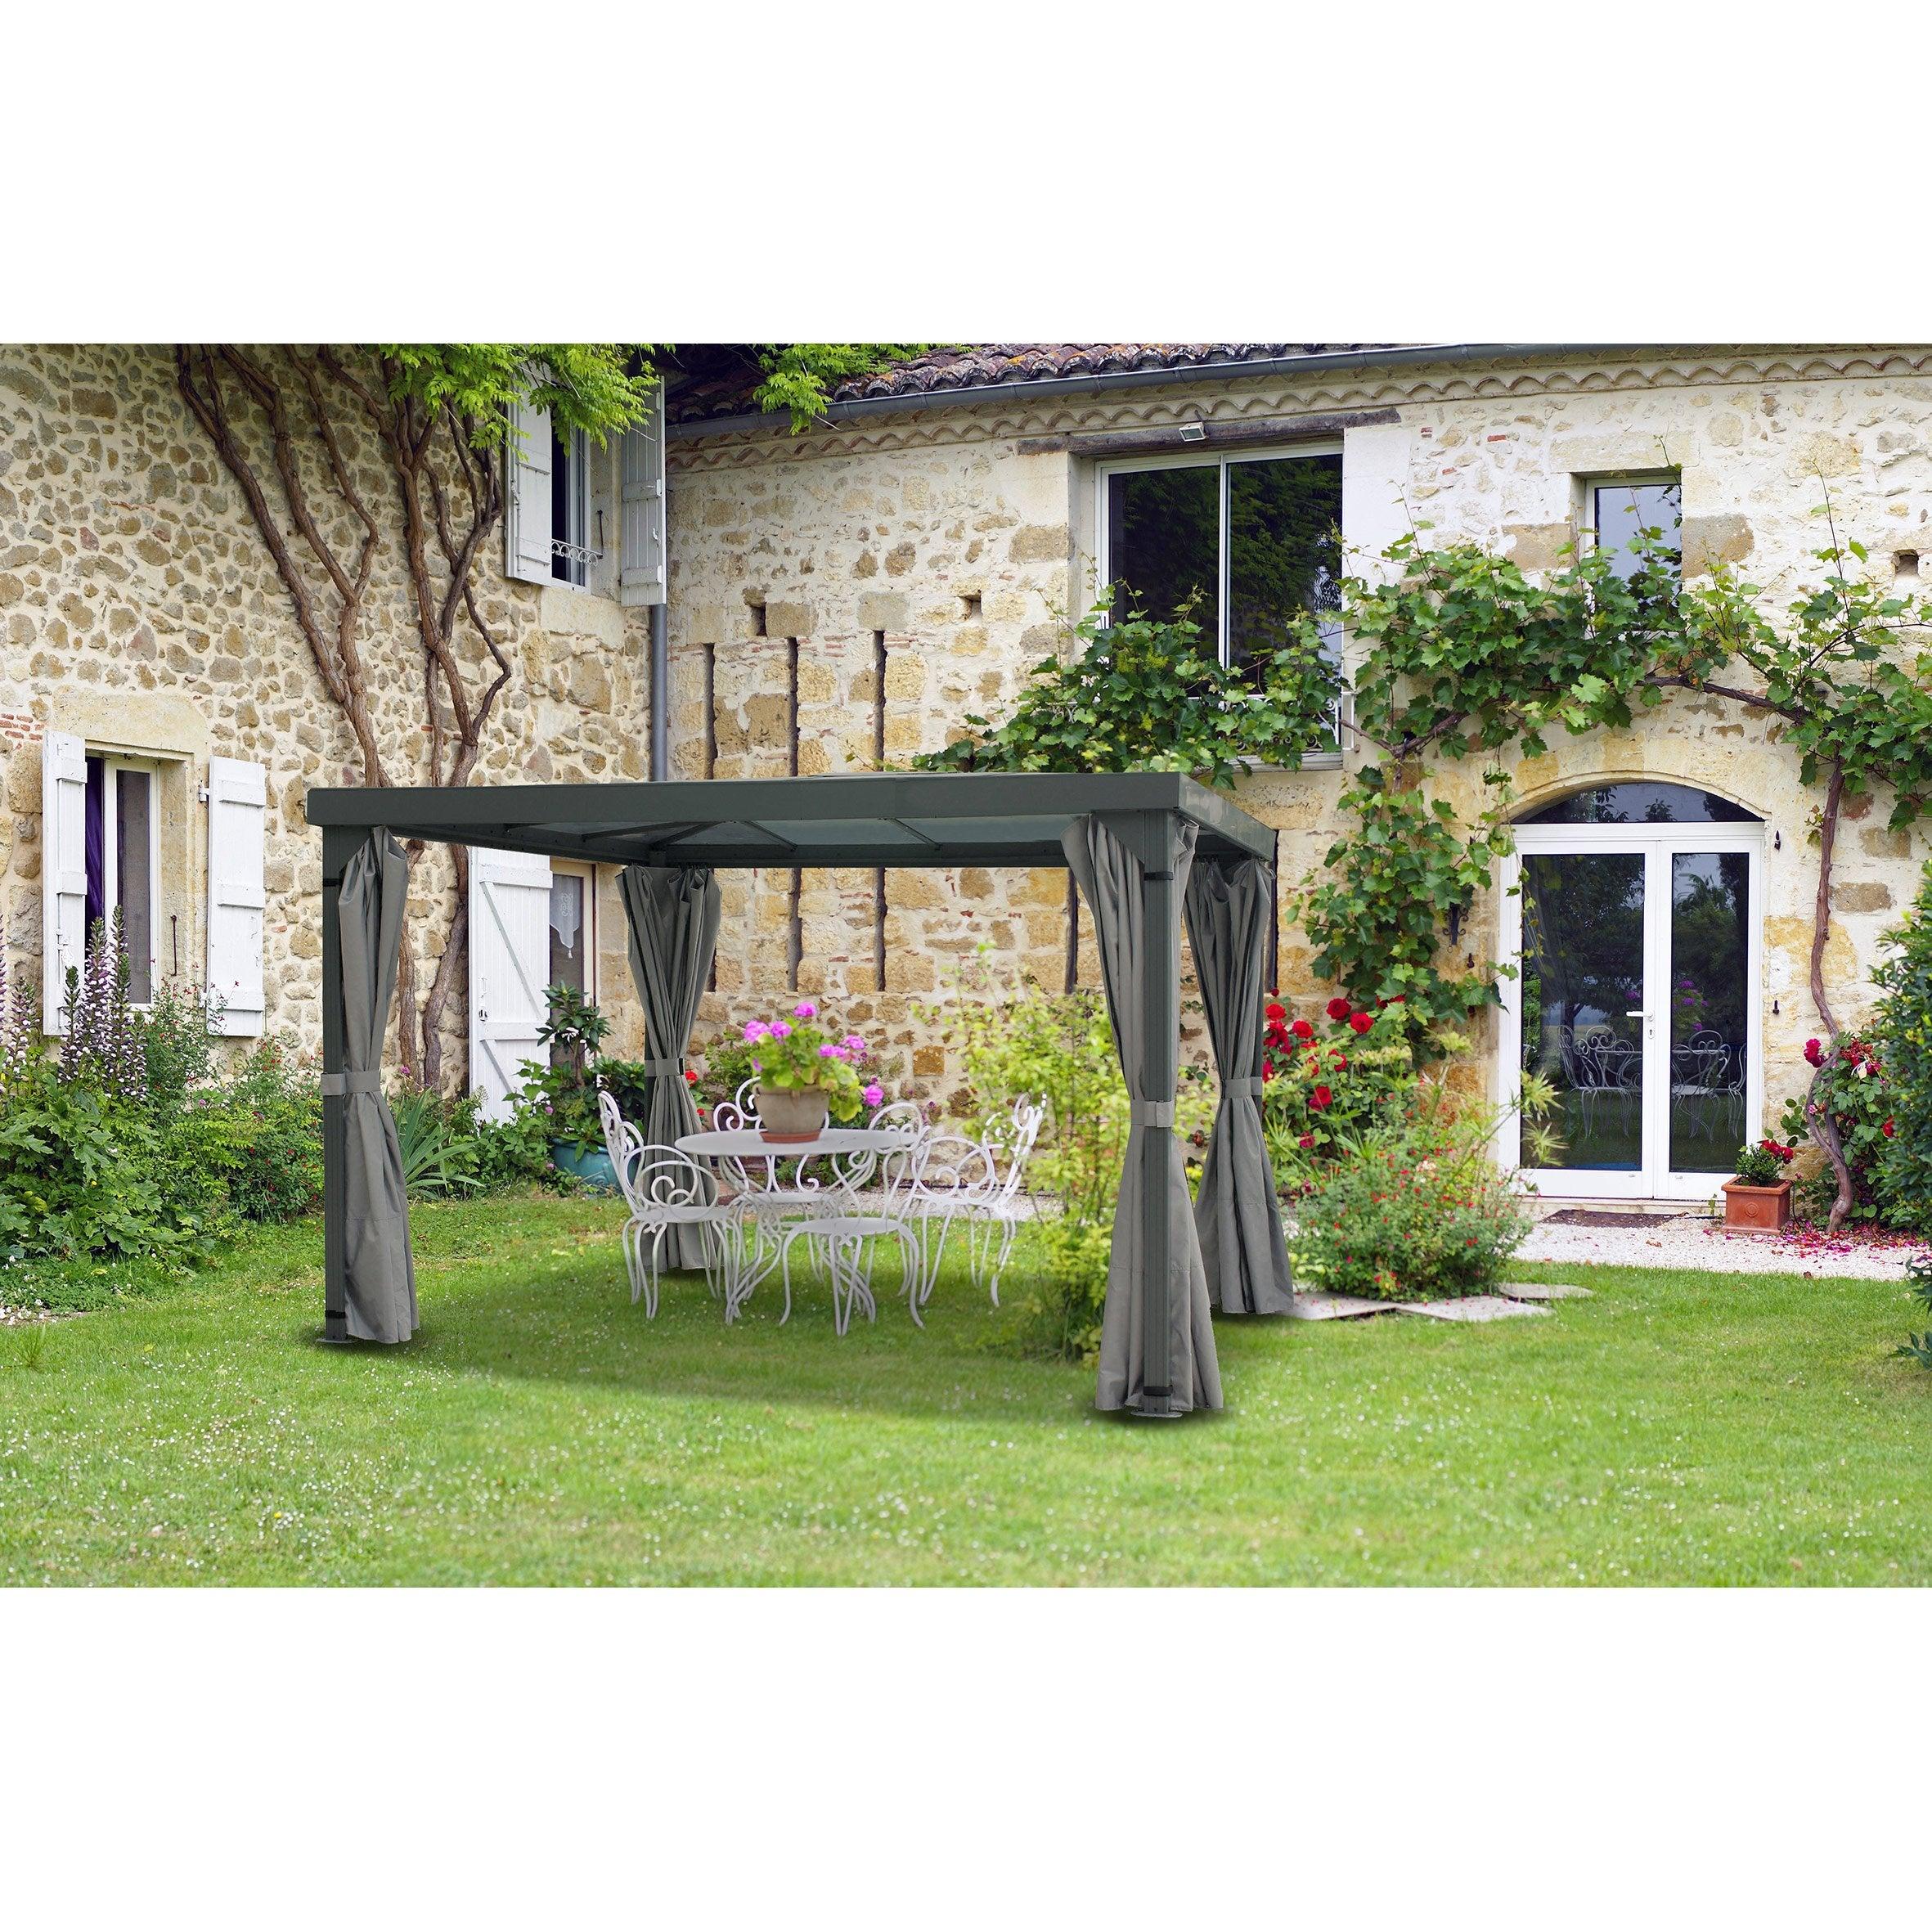 BoisDe Merlin Kiosque Meilleur PrixLeroy Jardin Au 5Ac3qRLS4j